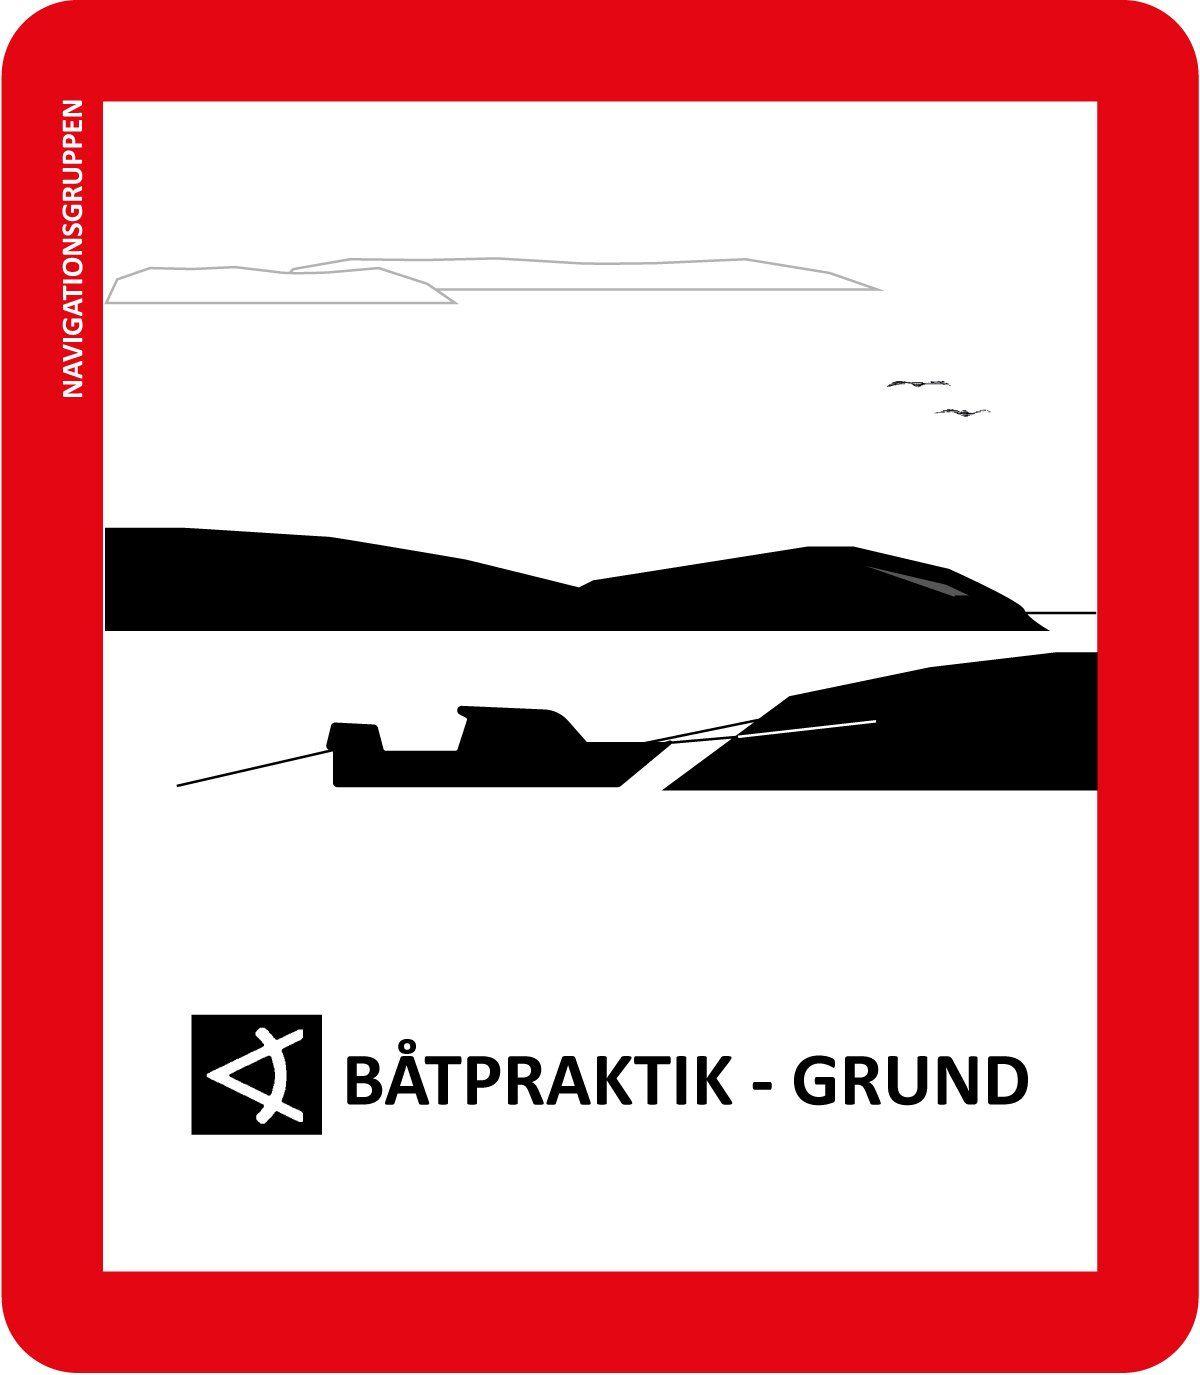 Båtpraktik kurs